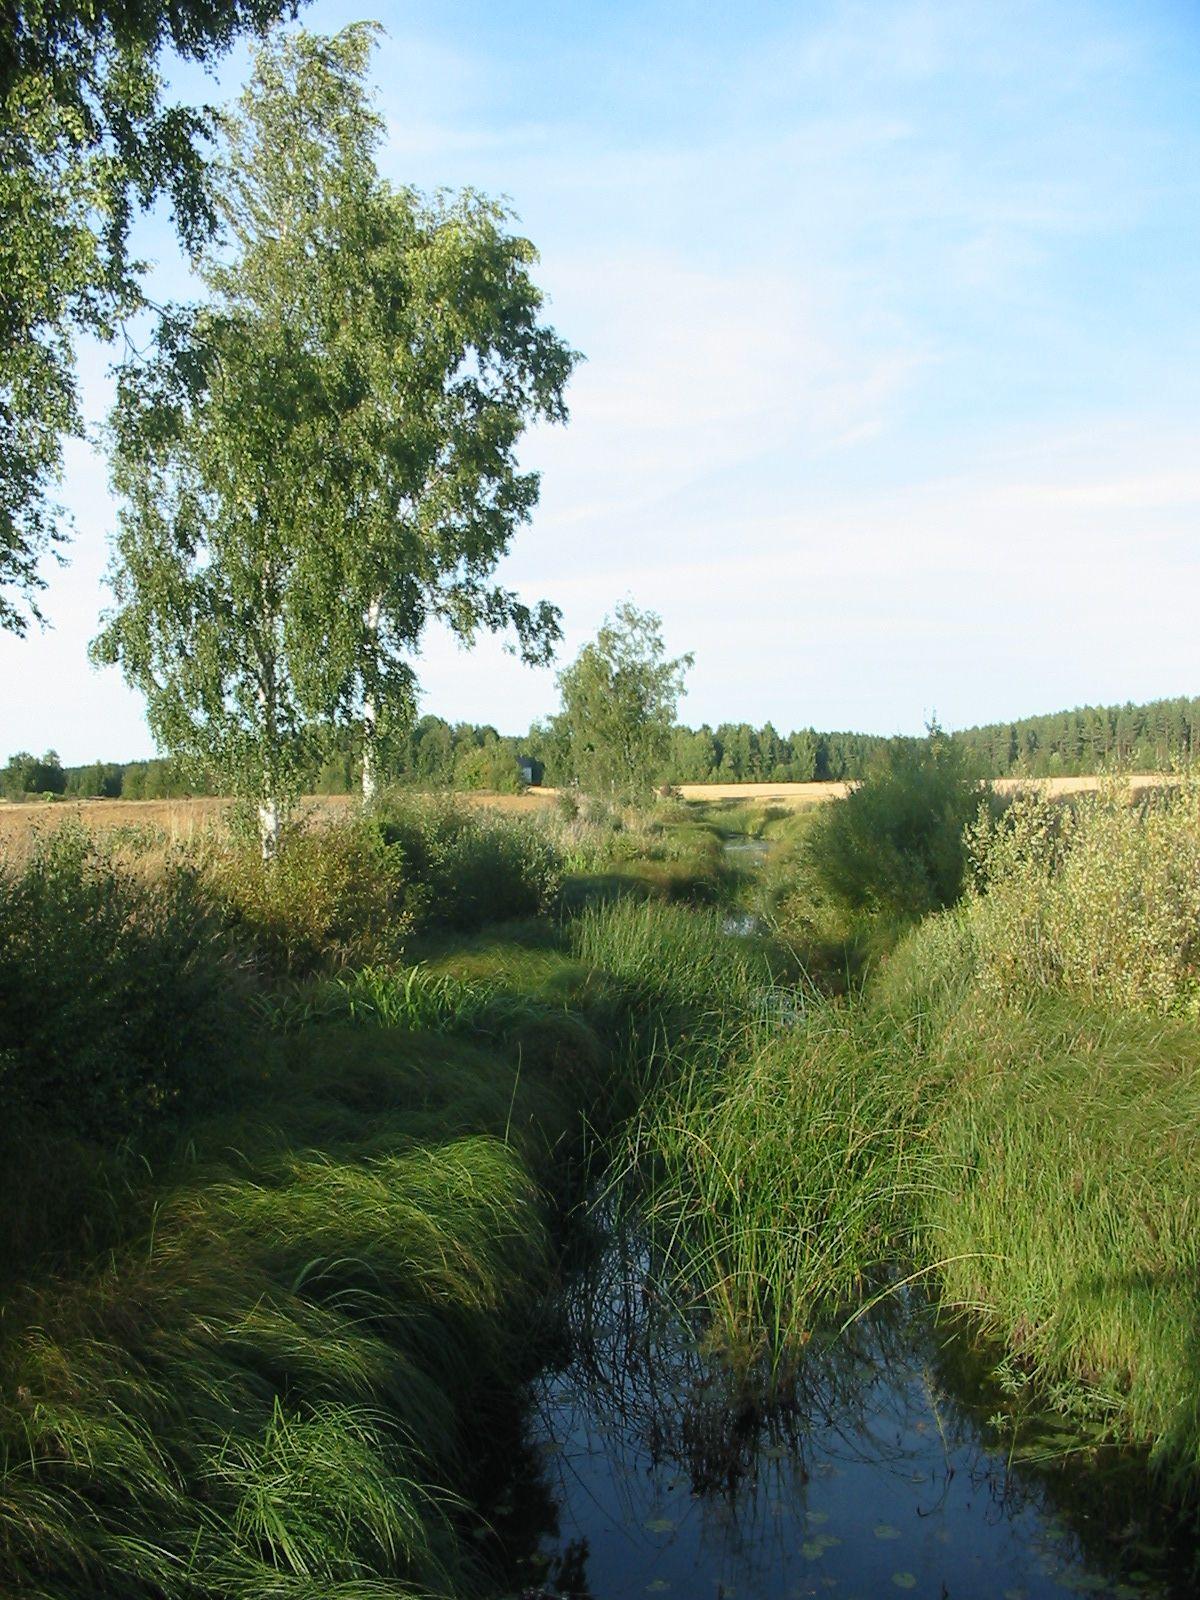 Kaljasjärvi